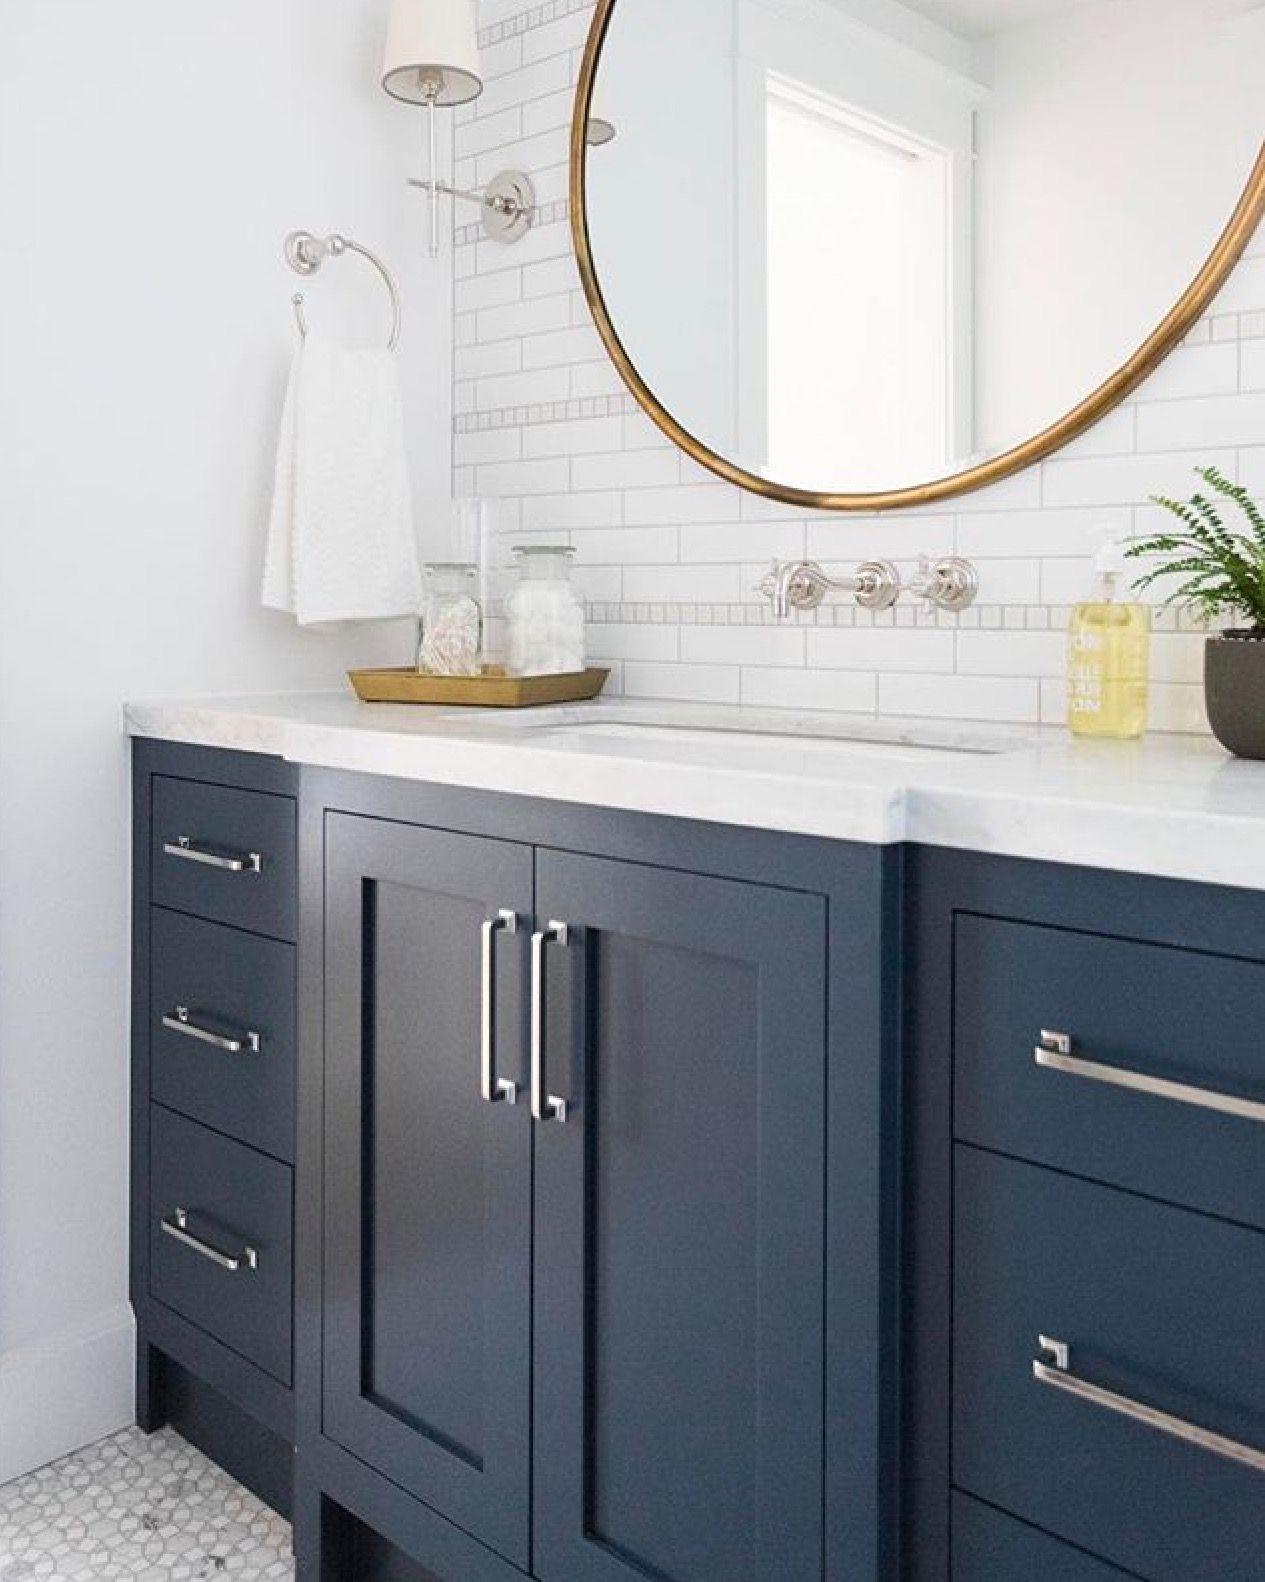 Pin By Ceyda Saral On Home Design Blue Bathroom Vanity Round Mirror Bathroom Navy Blue Bathrooms [ 1582 x 1265 Pixel ]